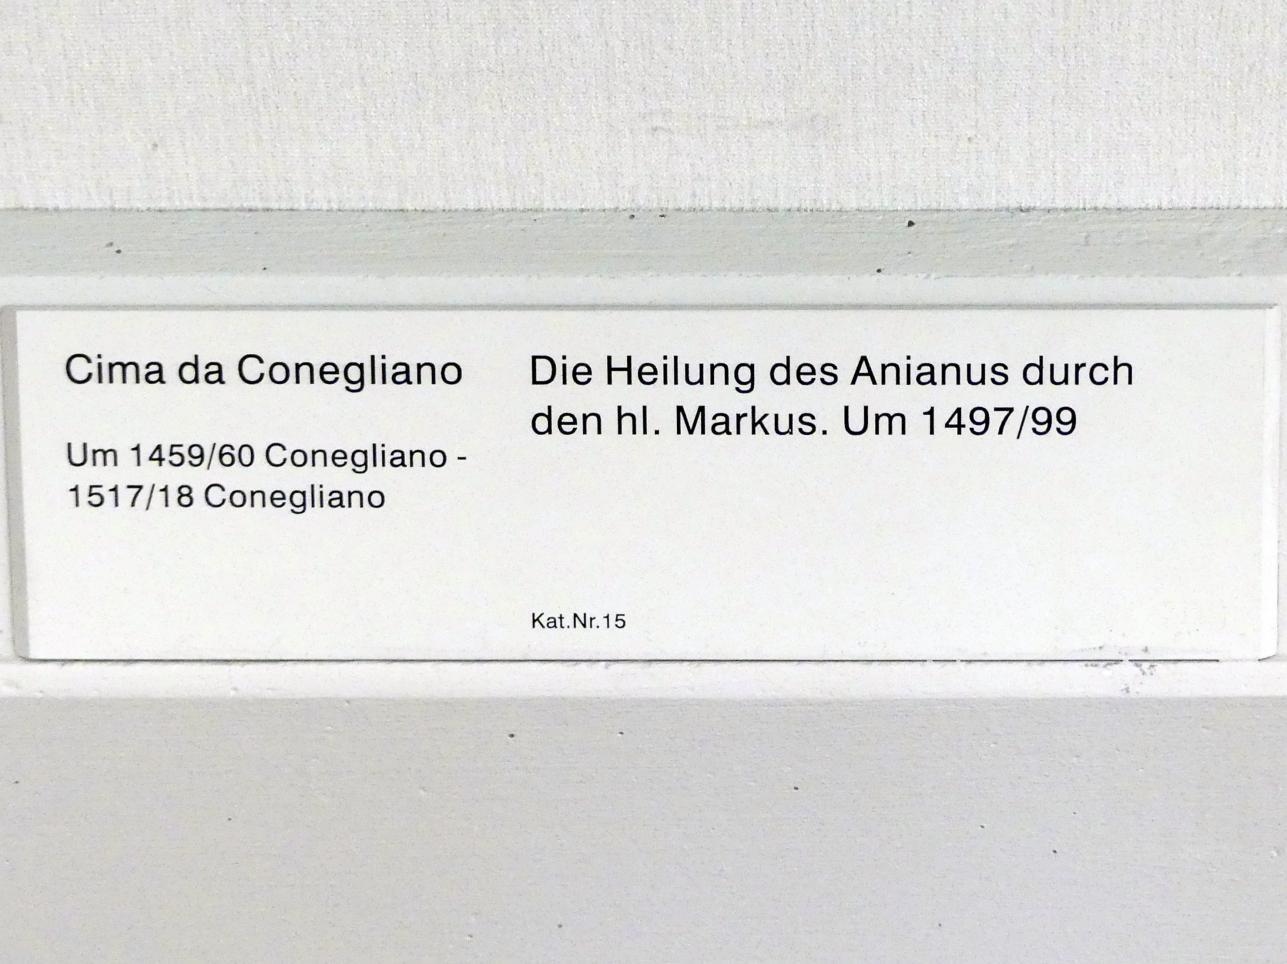 Giovanni Battista Cima (Cima da Conegliano): Die Heilung des Anianus durch den hl. Markus, Um 1497 - 1499